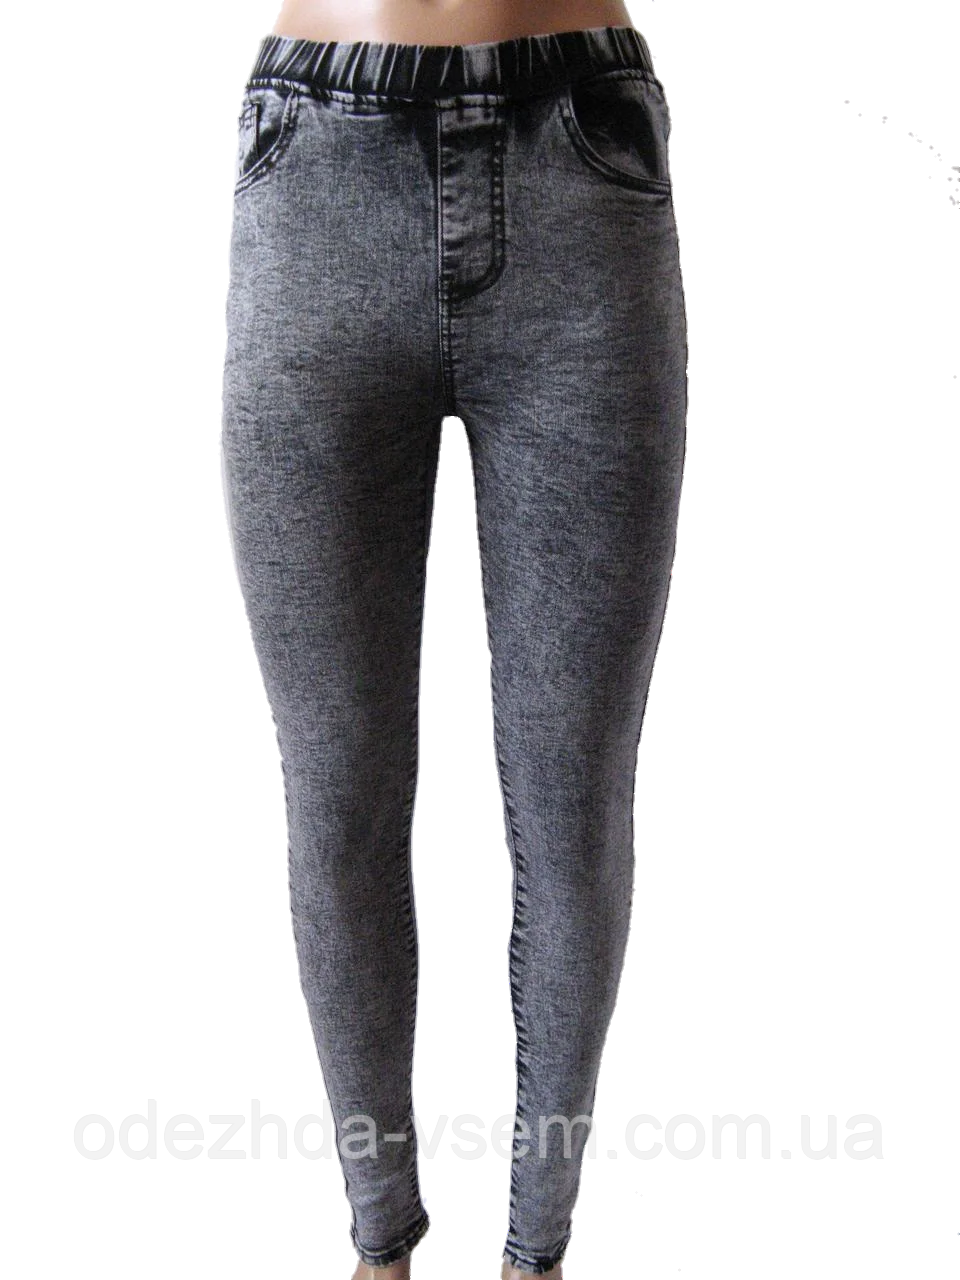 Женские джинсы Варёнки